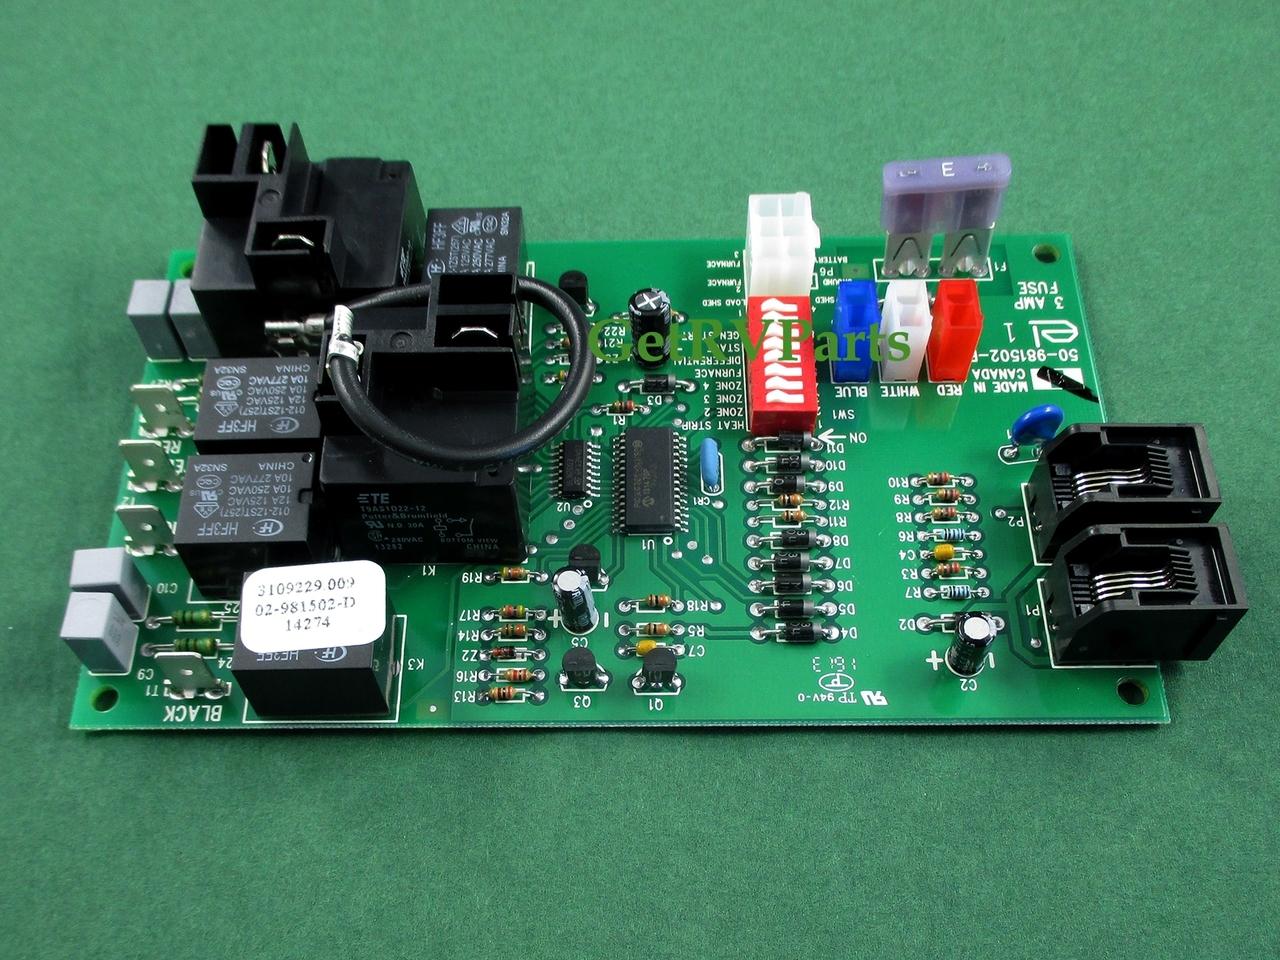 XH_1440] Air Conditioner Circuit Free DiagramTomy Indi Mohammedshrine Librar Wiring 101